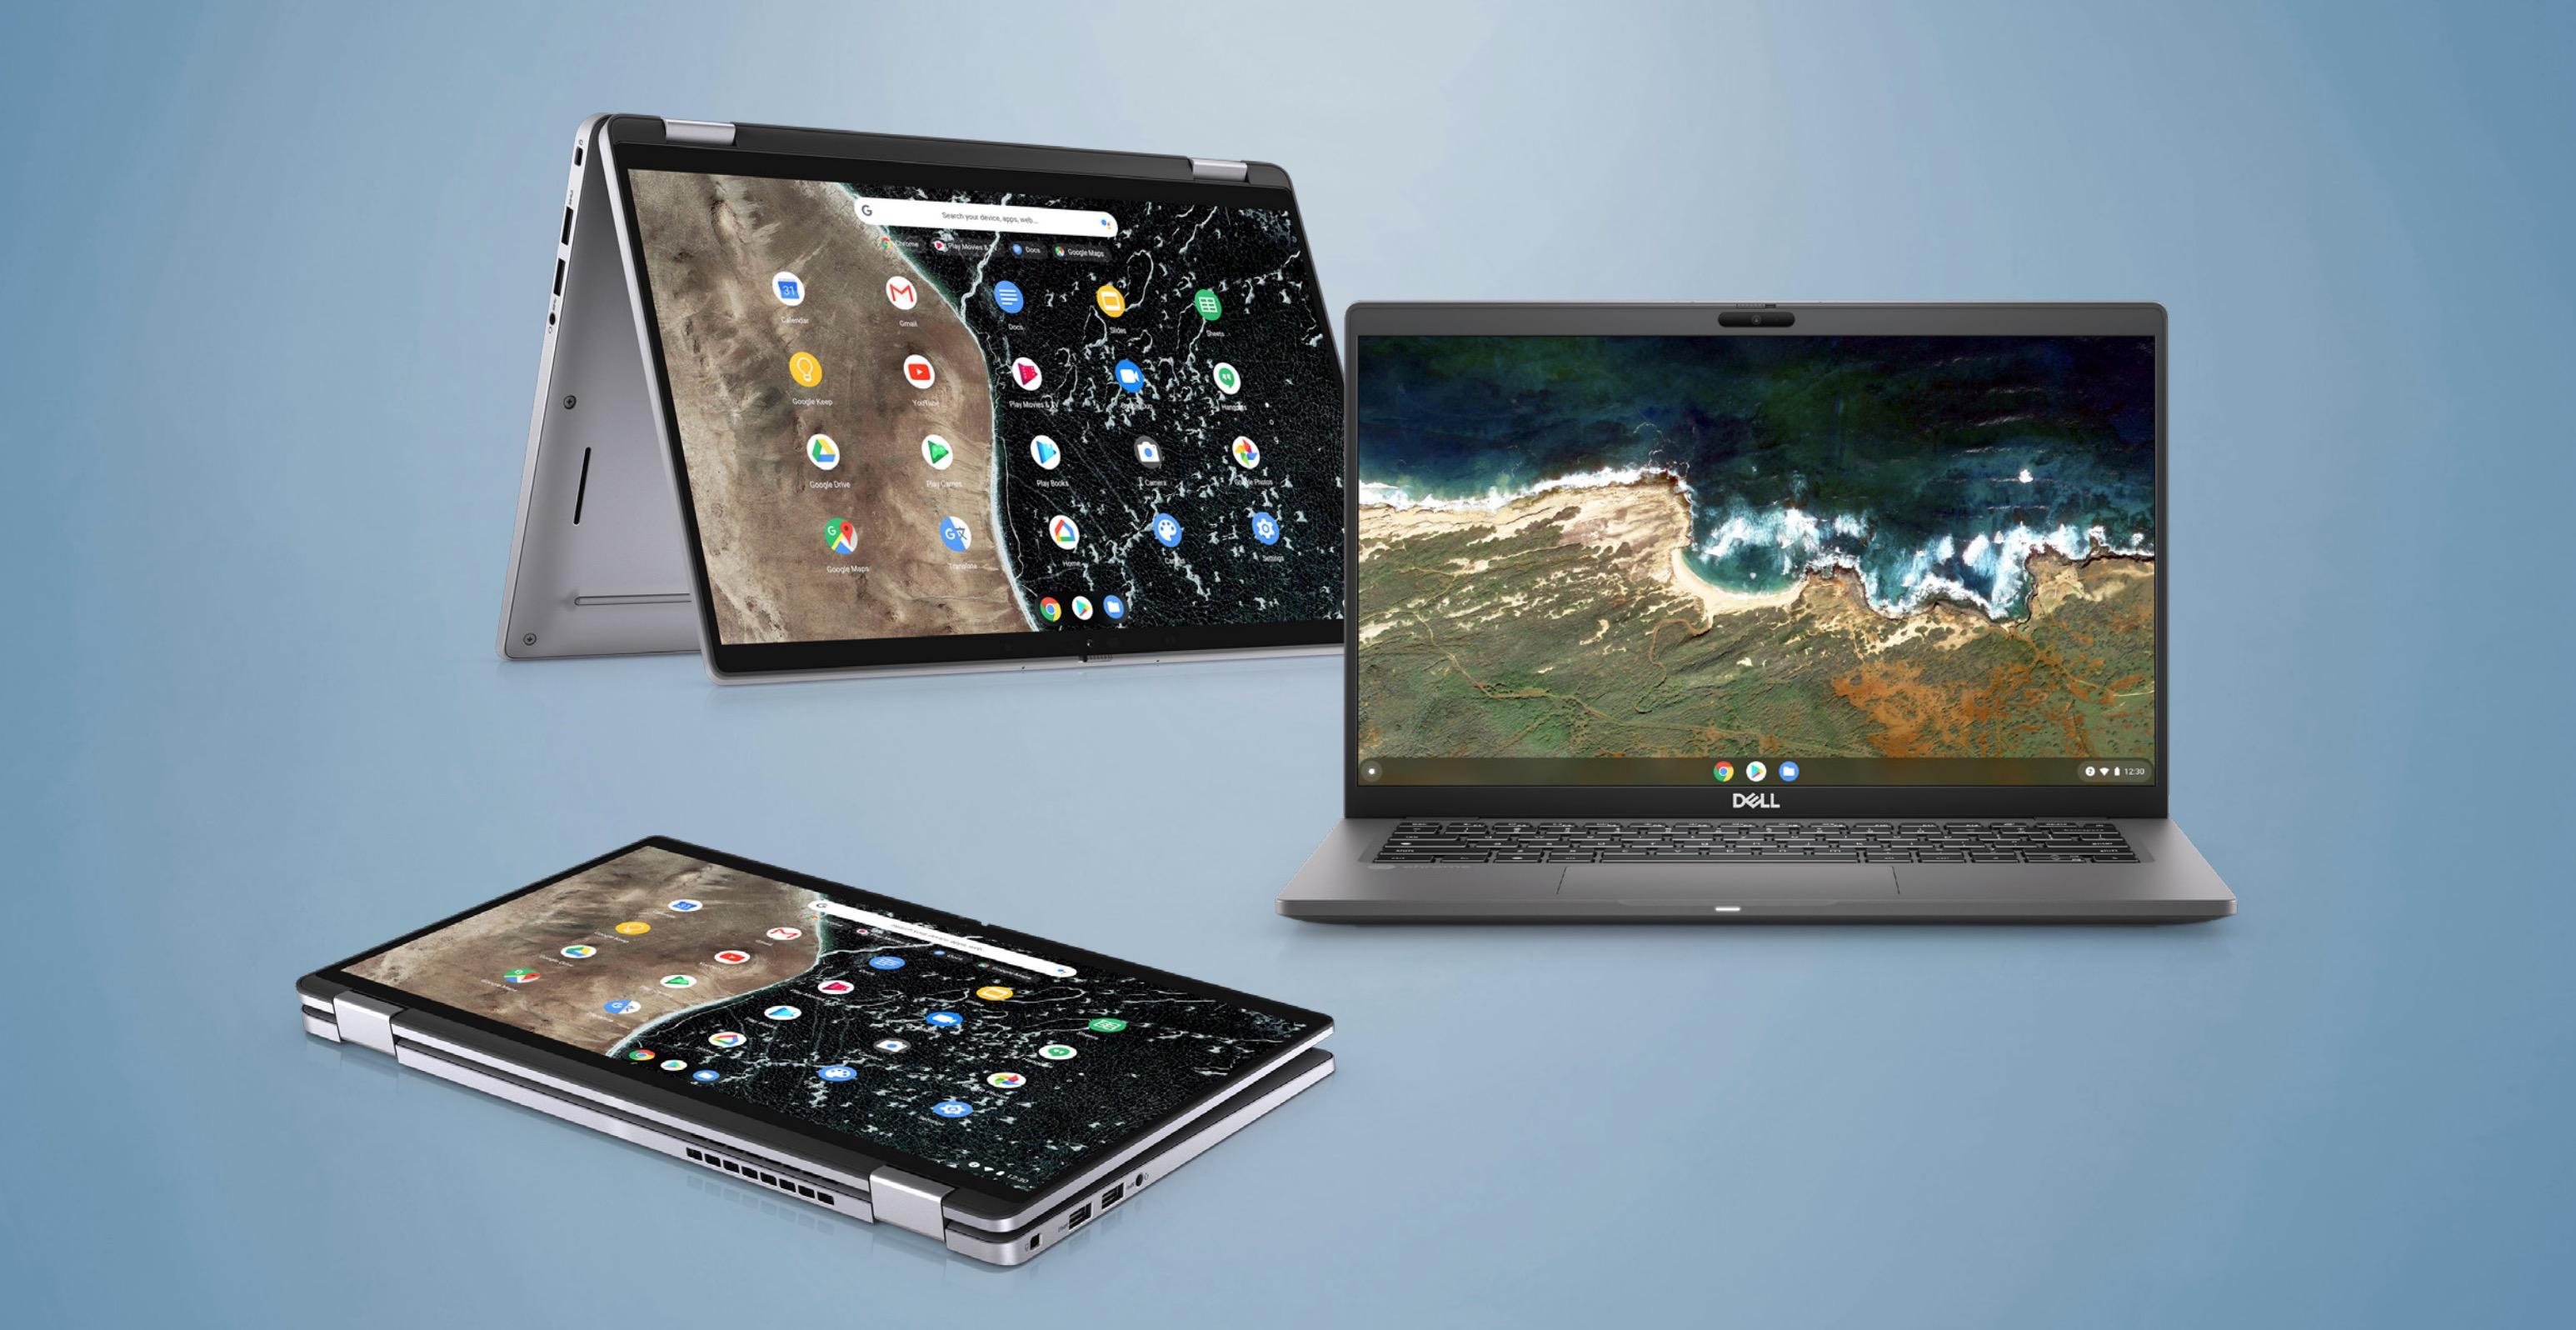 New Dell Latitude Chromebook Targets the Enterprise